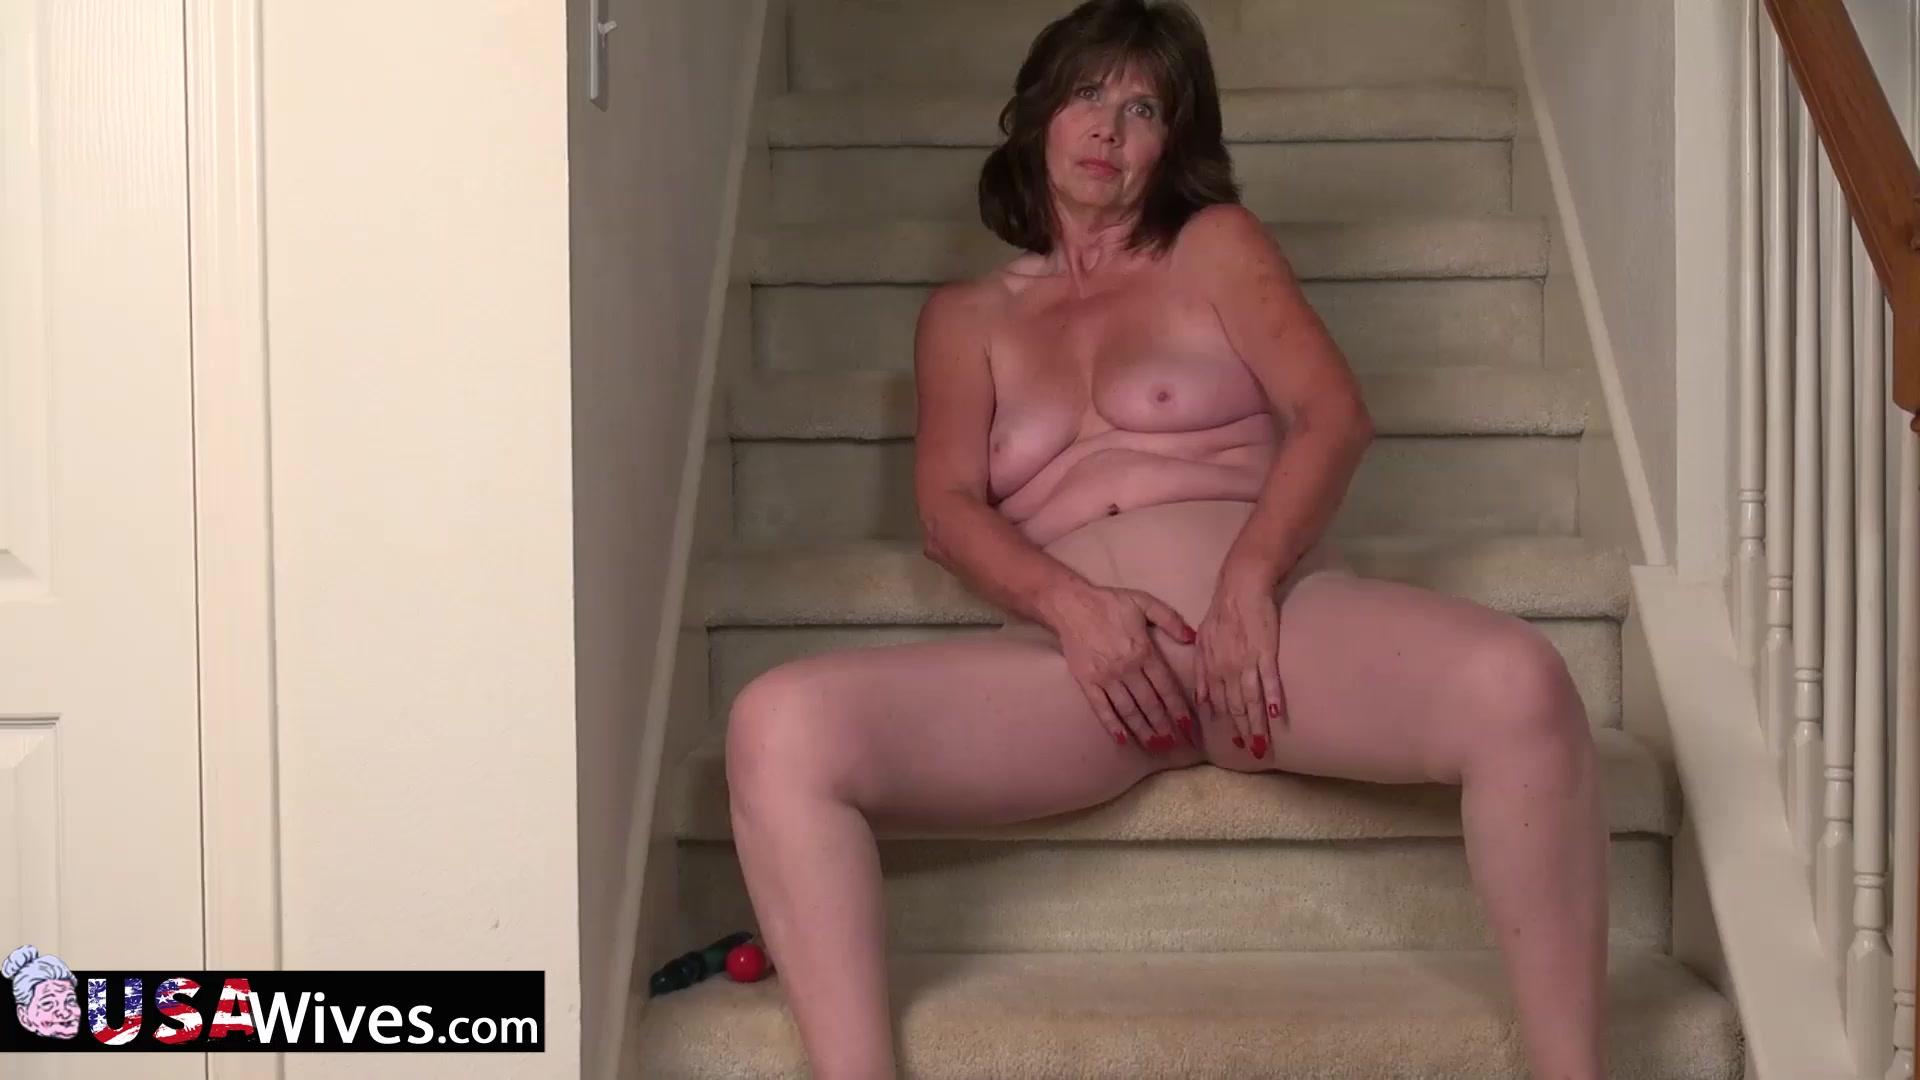 Hot Nude gallery Ascesa del re stregone online dating